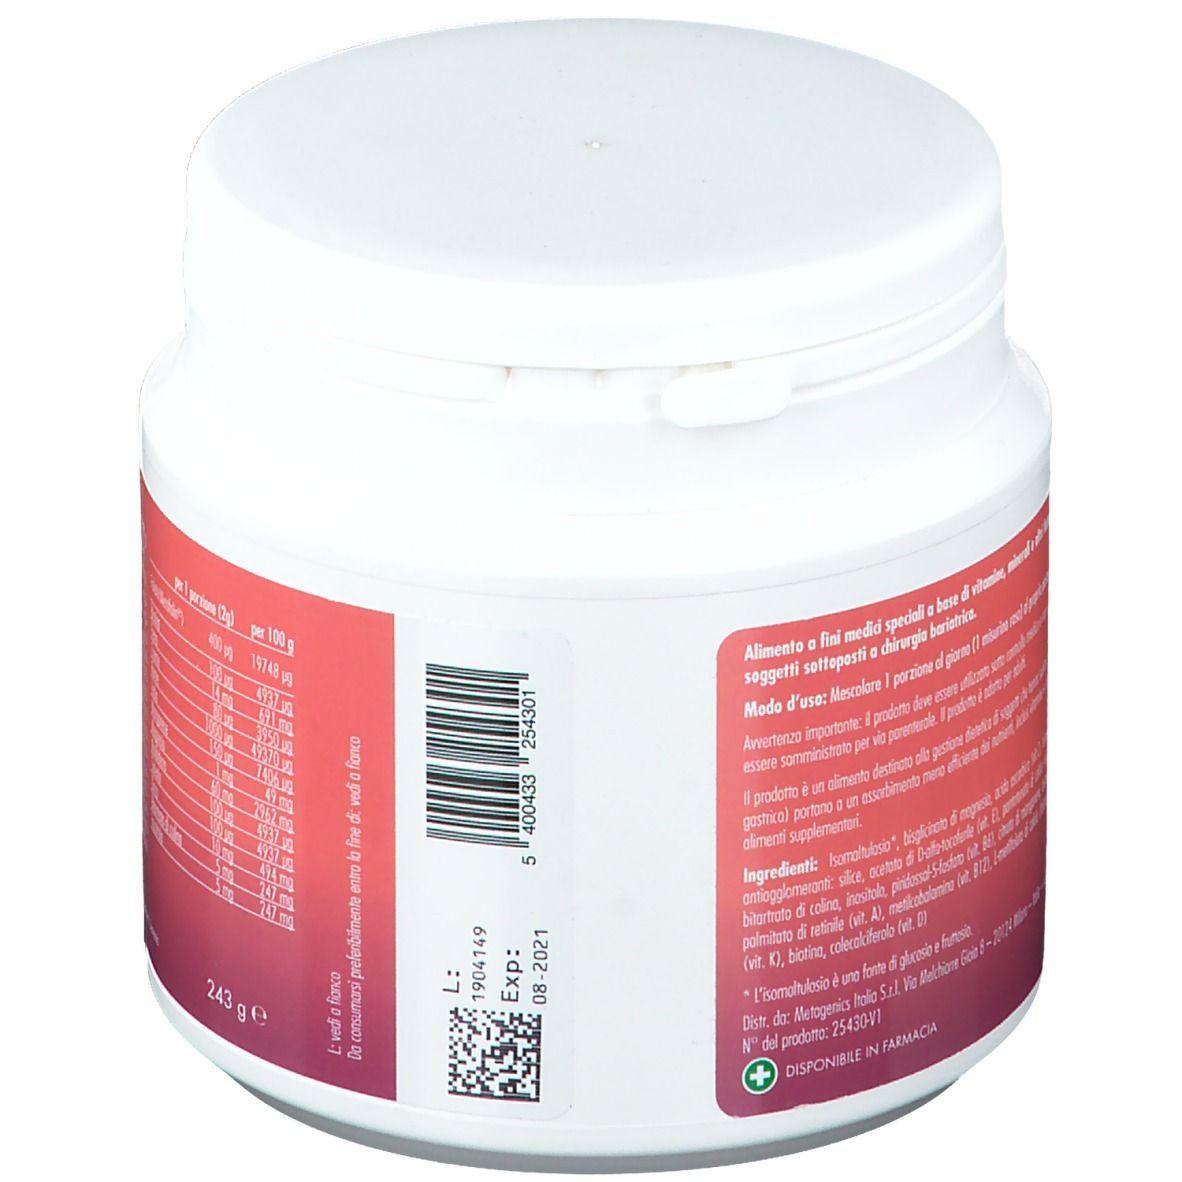 Barinutrics Multi Polvere Gusto Neutro